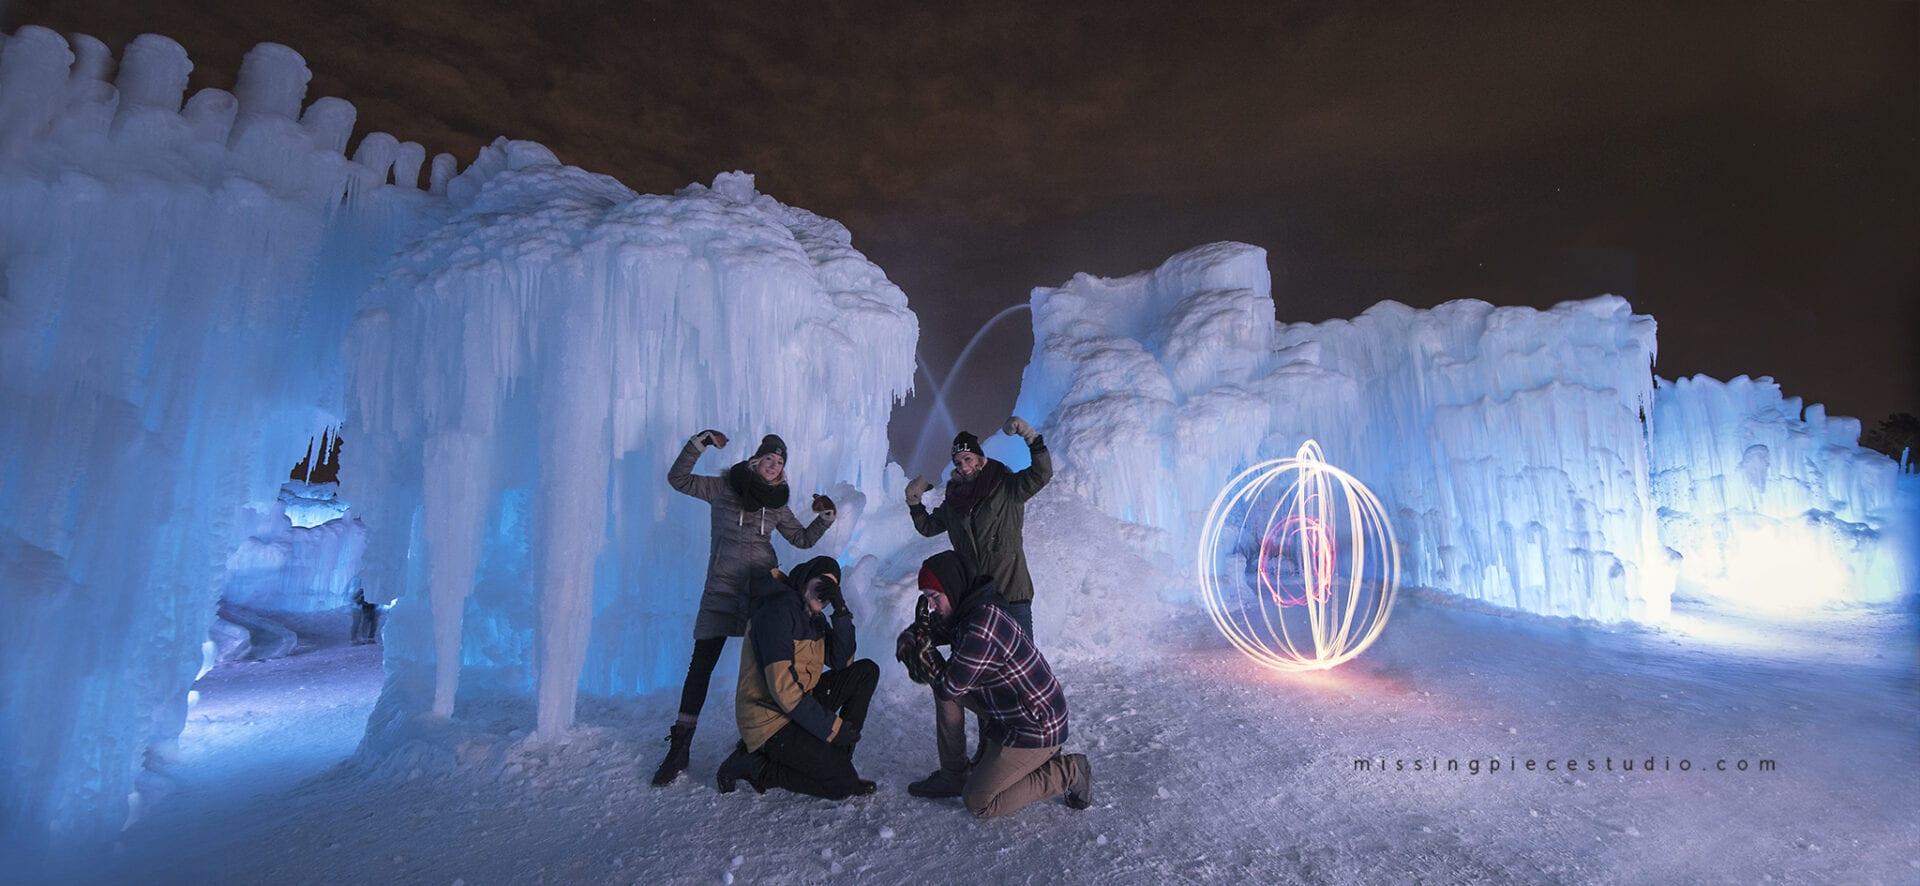 Ice Castles Edmonton Alberta Winter Visit Hawrelak Park-light painting orb